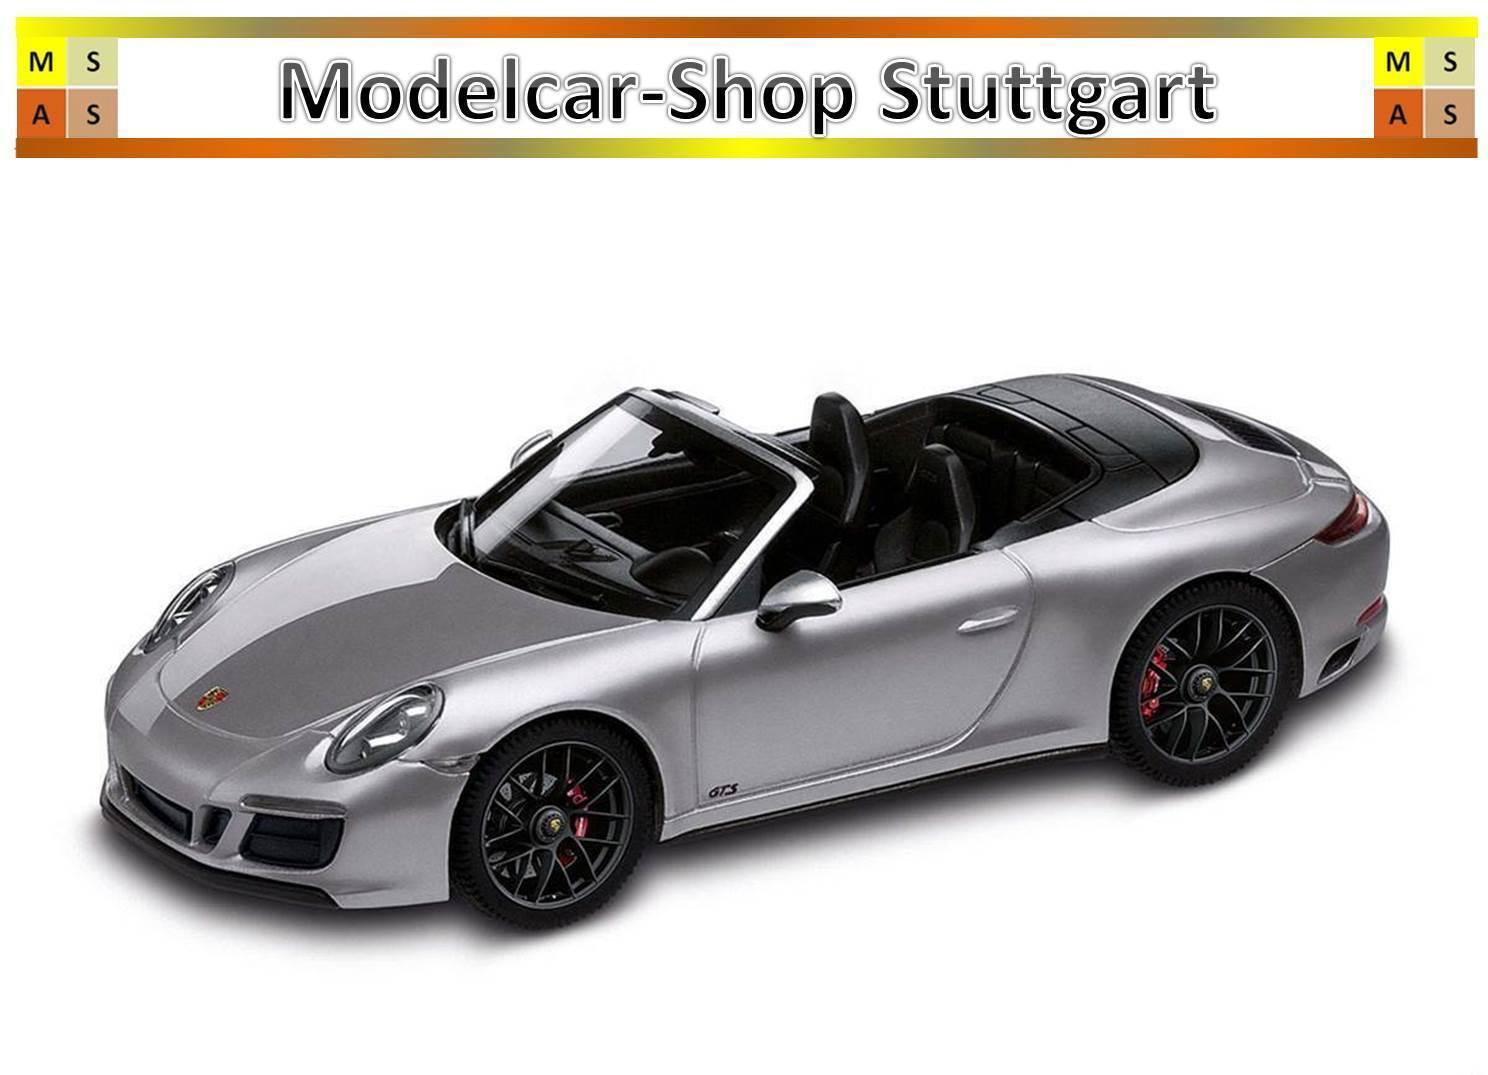 Porsche 911 Carrera 4 GTS Cabriolet silver Herpa 1 43 WAP0201040H neu